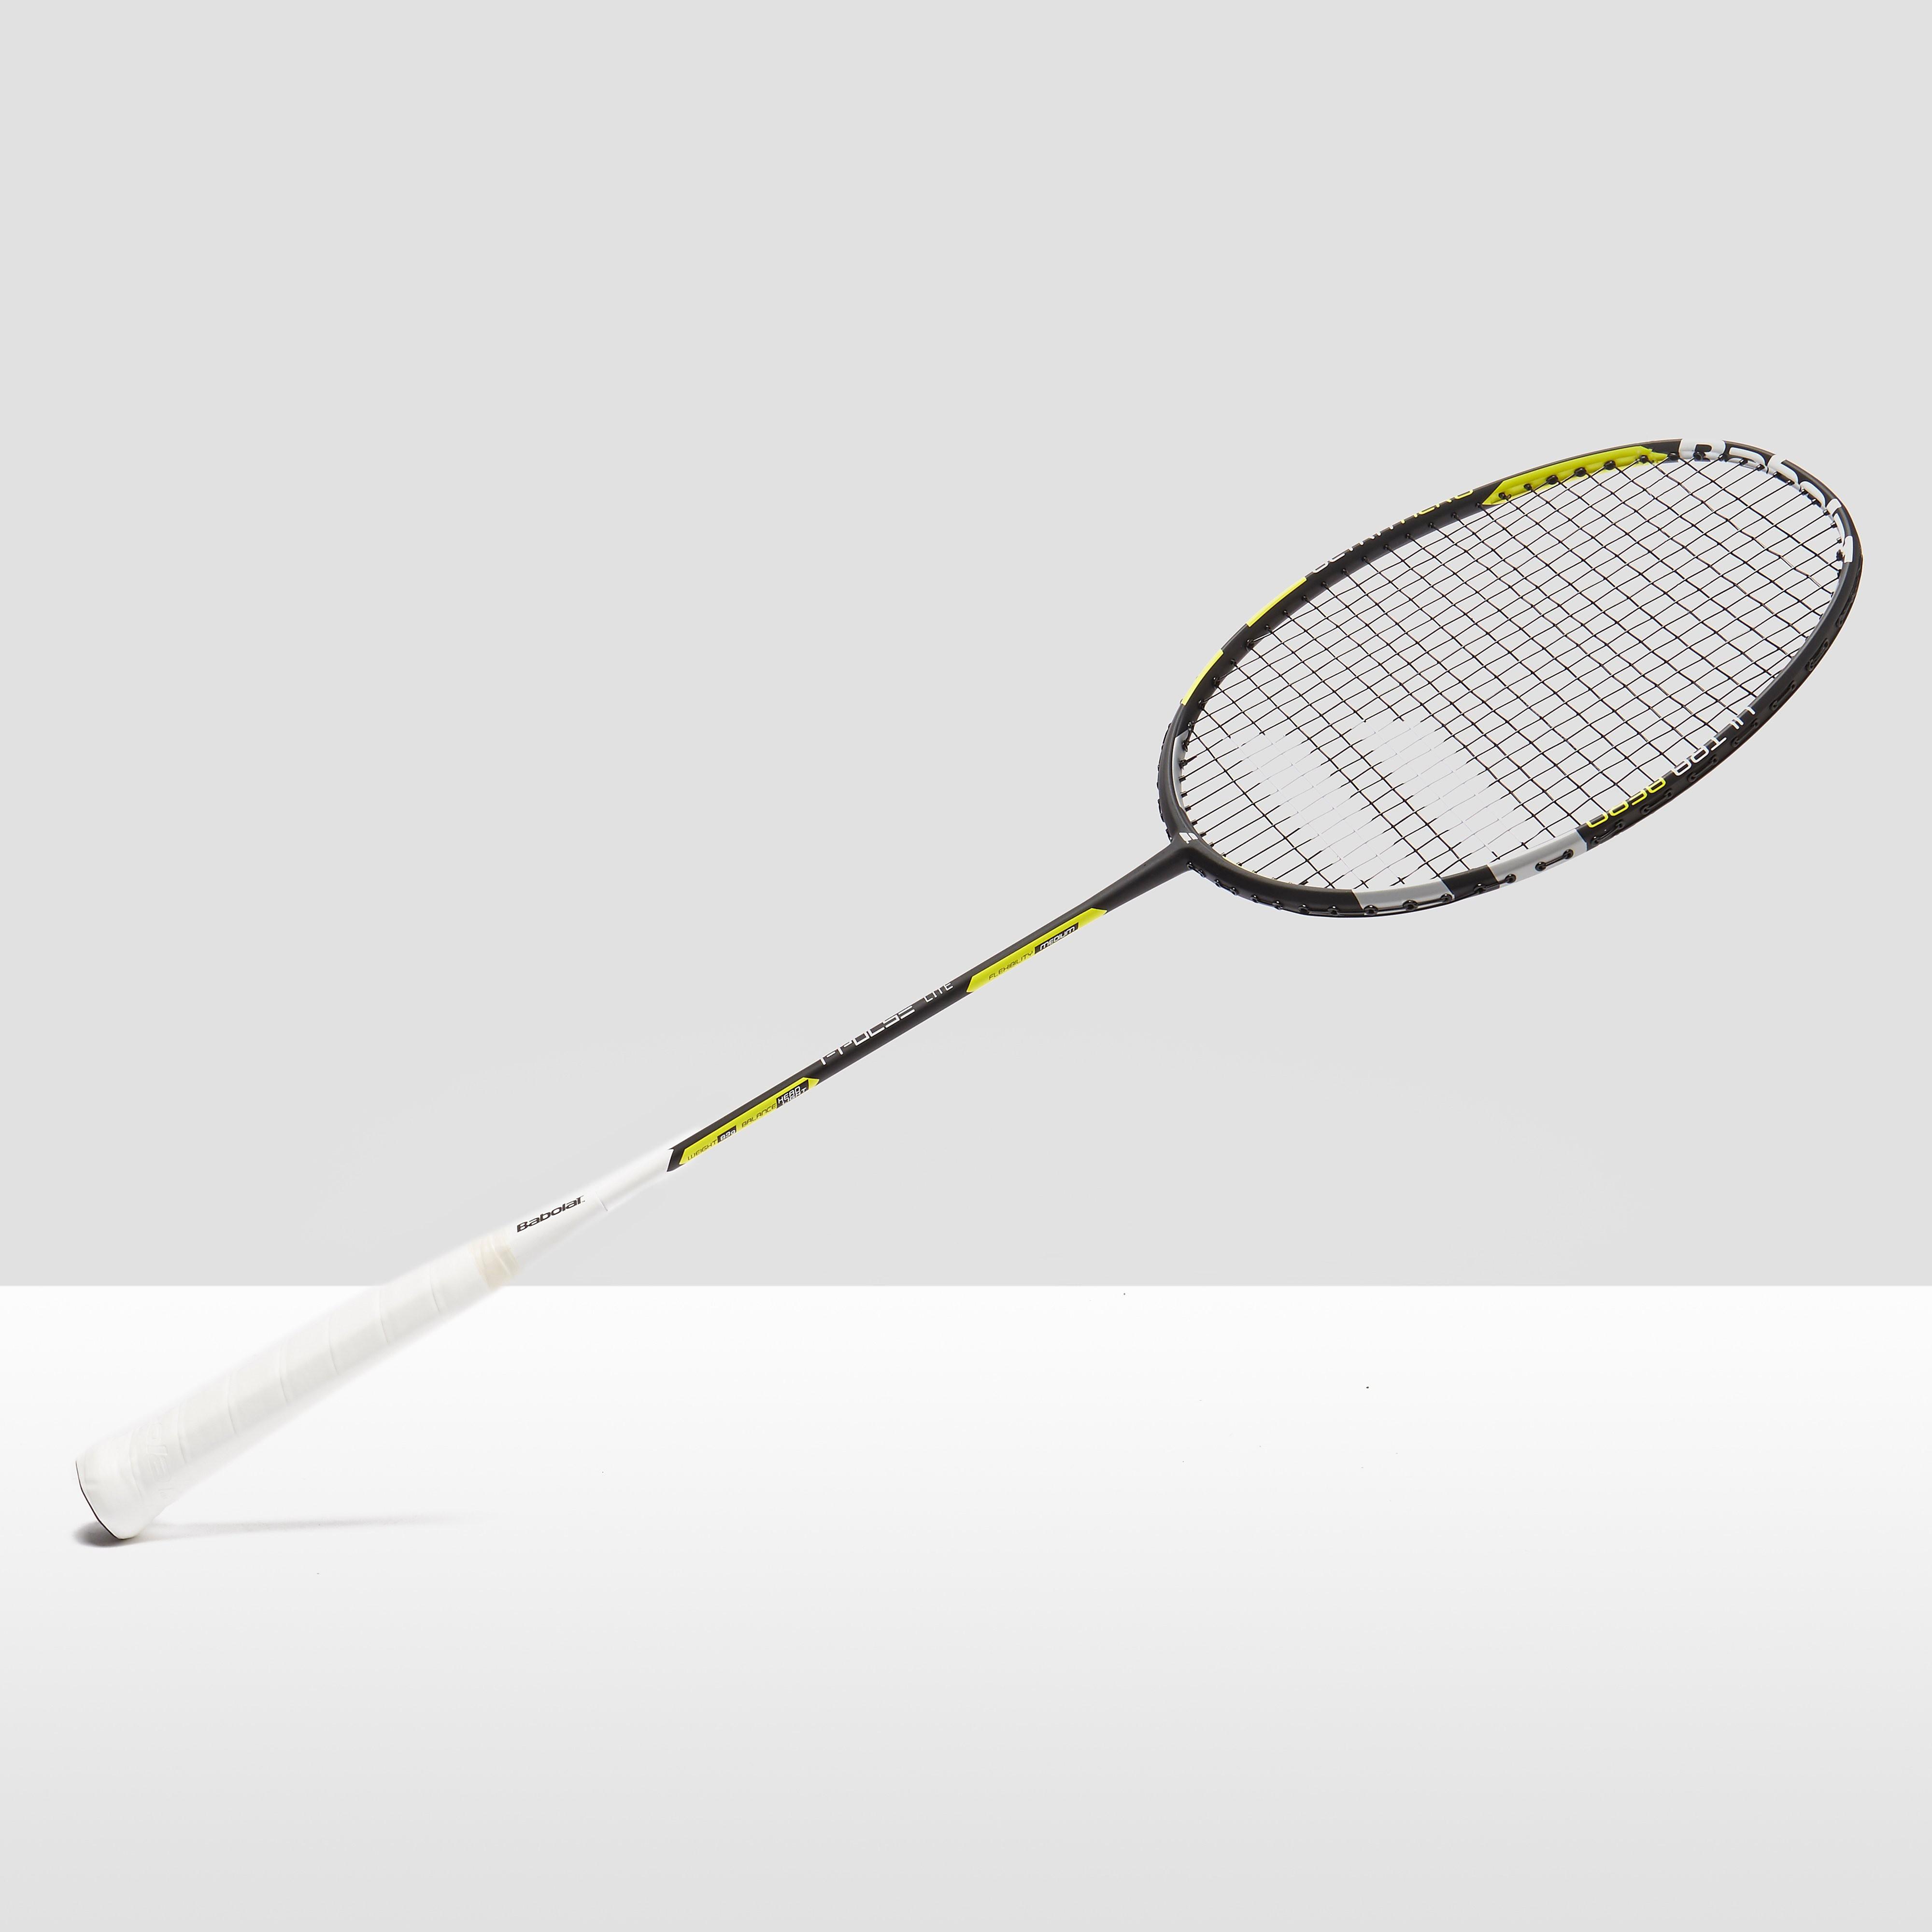 Babolat i Pulse Lite Badminton Racket